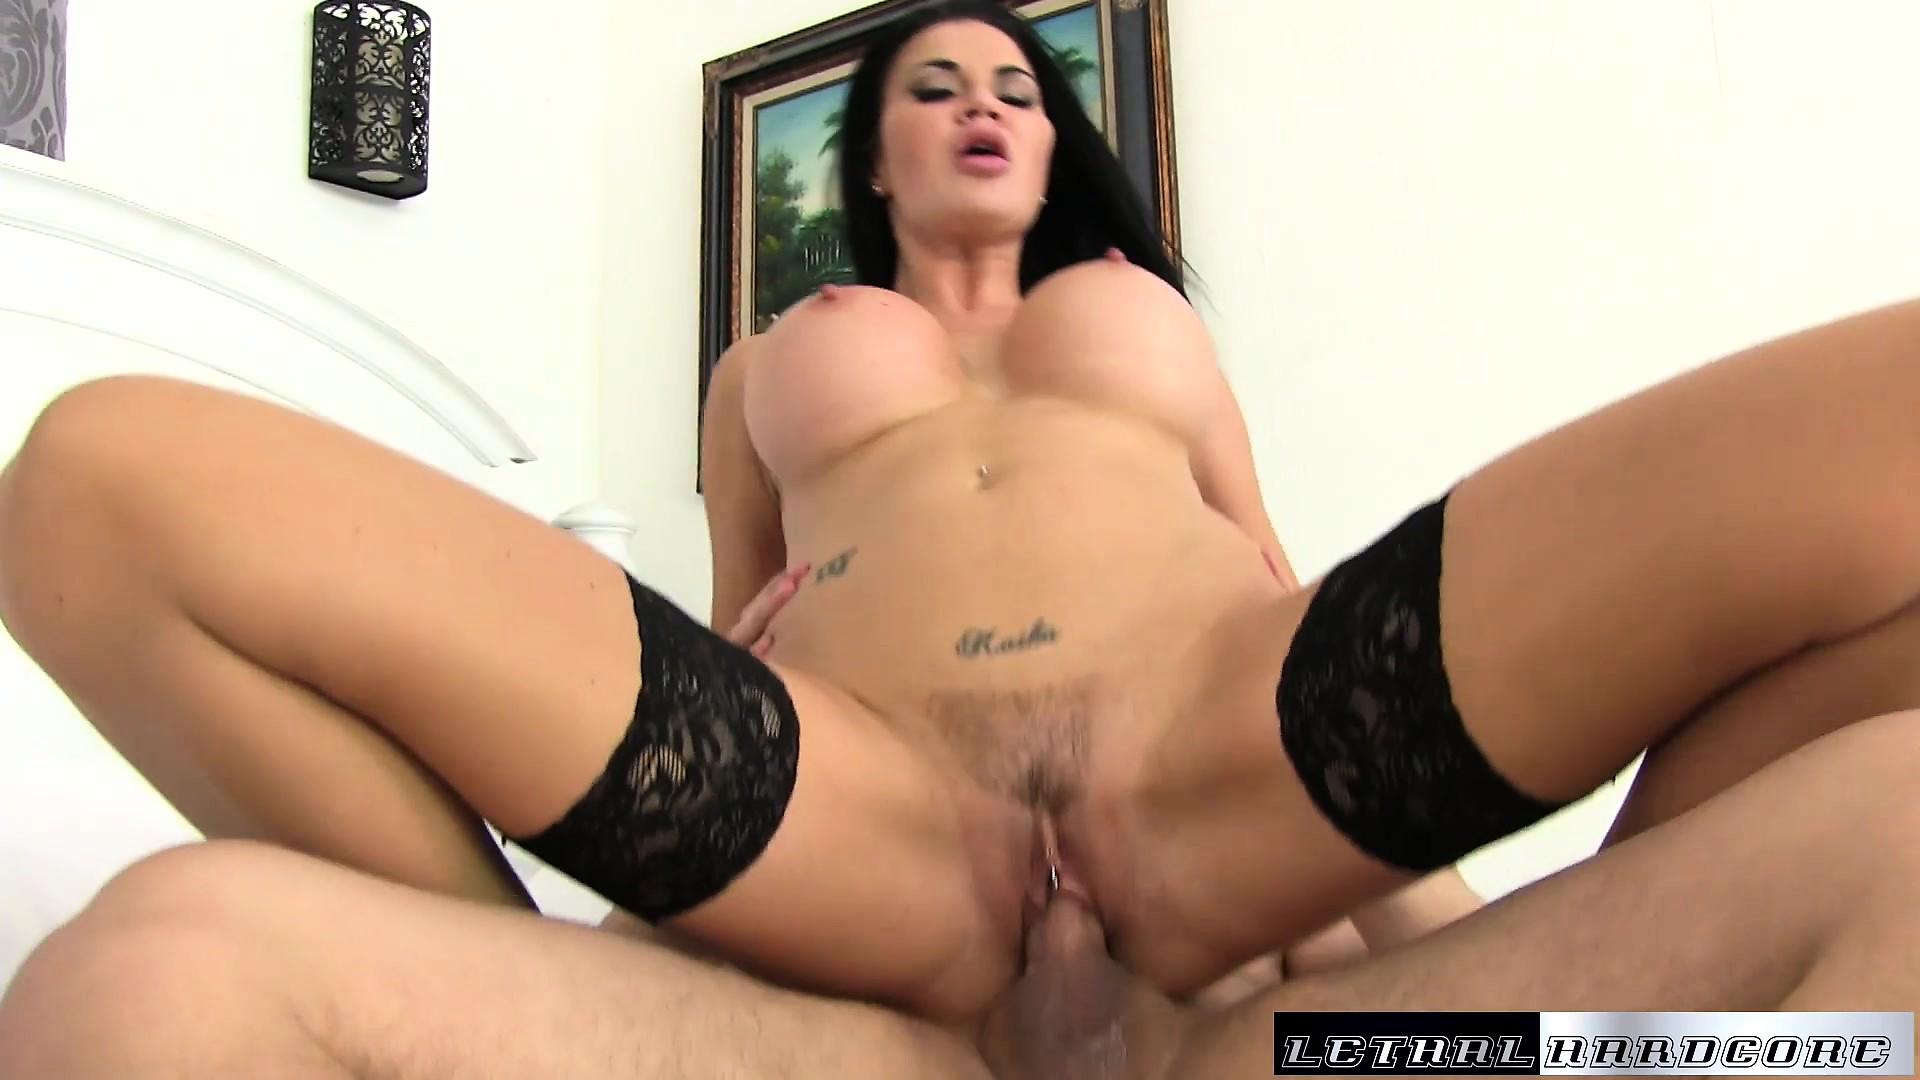 Big tits latina getting fucked